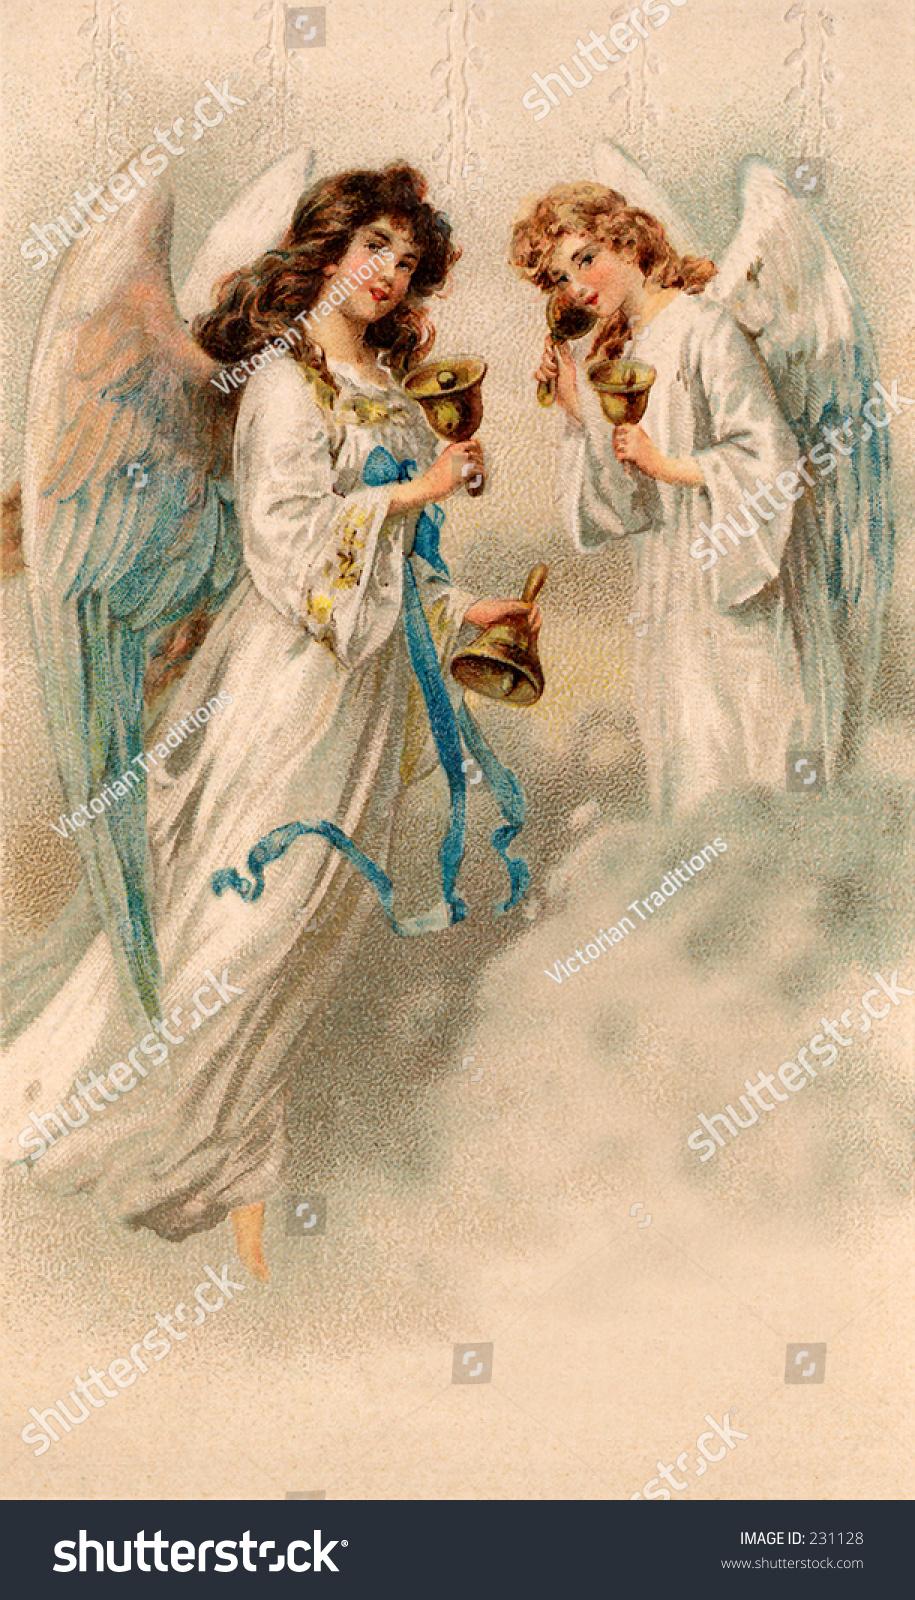 Christmas Angels A 1912 Vintage Illustration 231128